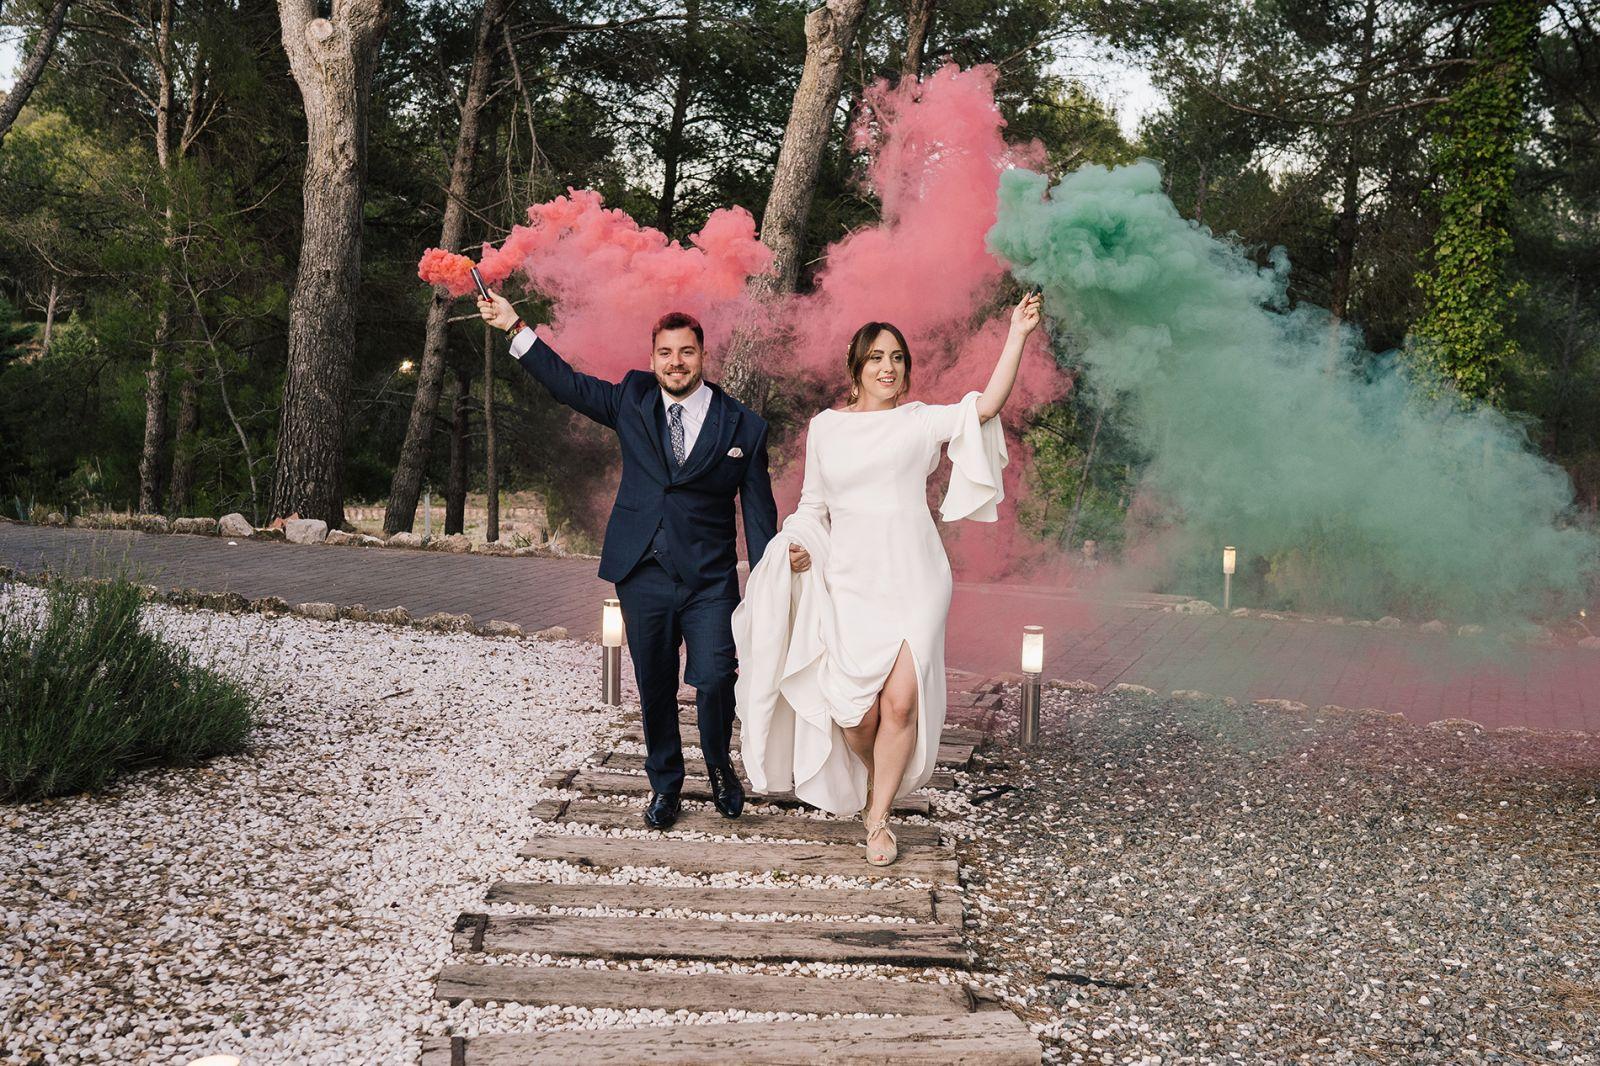 fotografo de bodas en tarragona, castell tallat